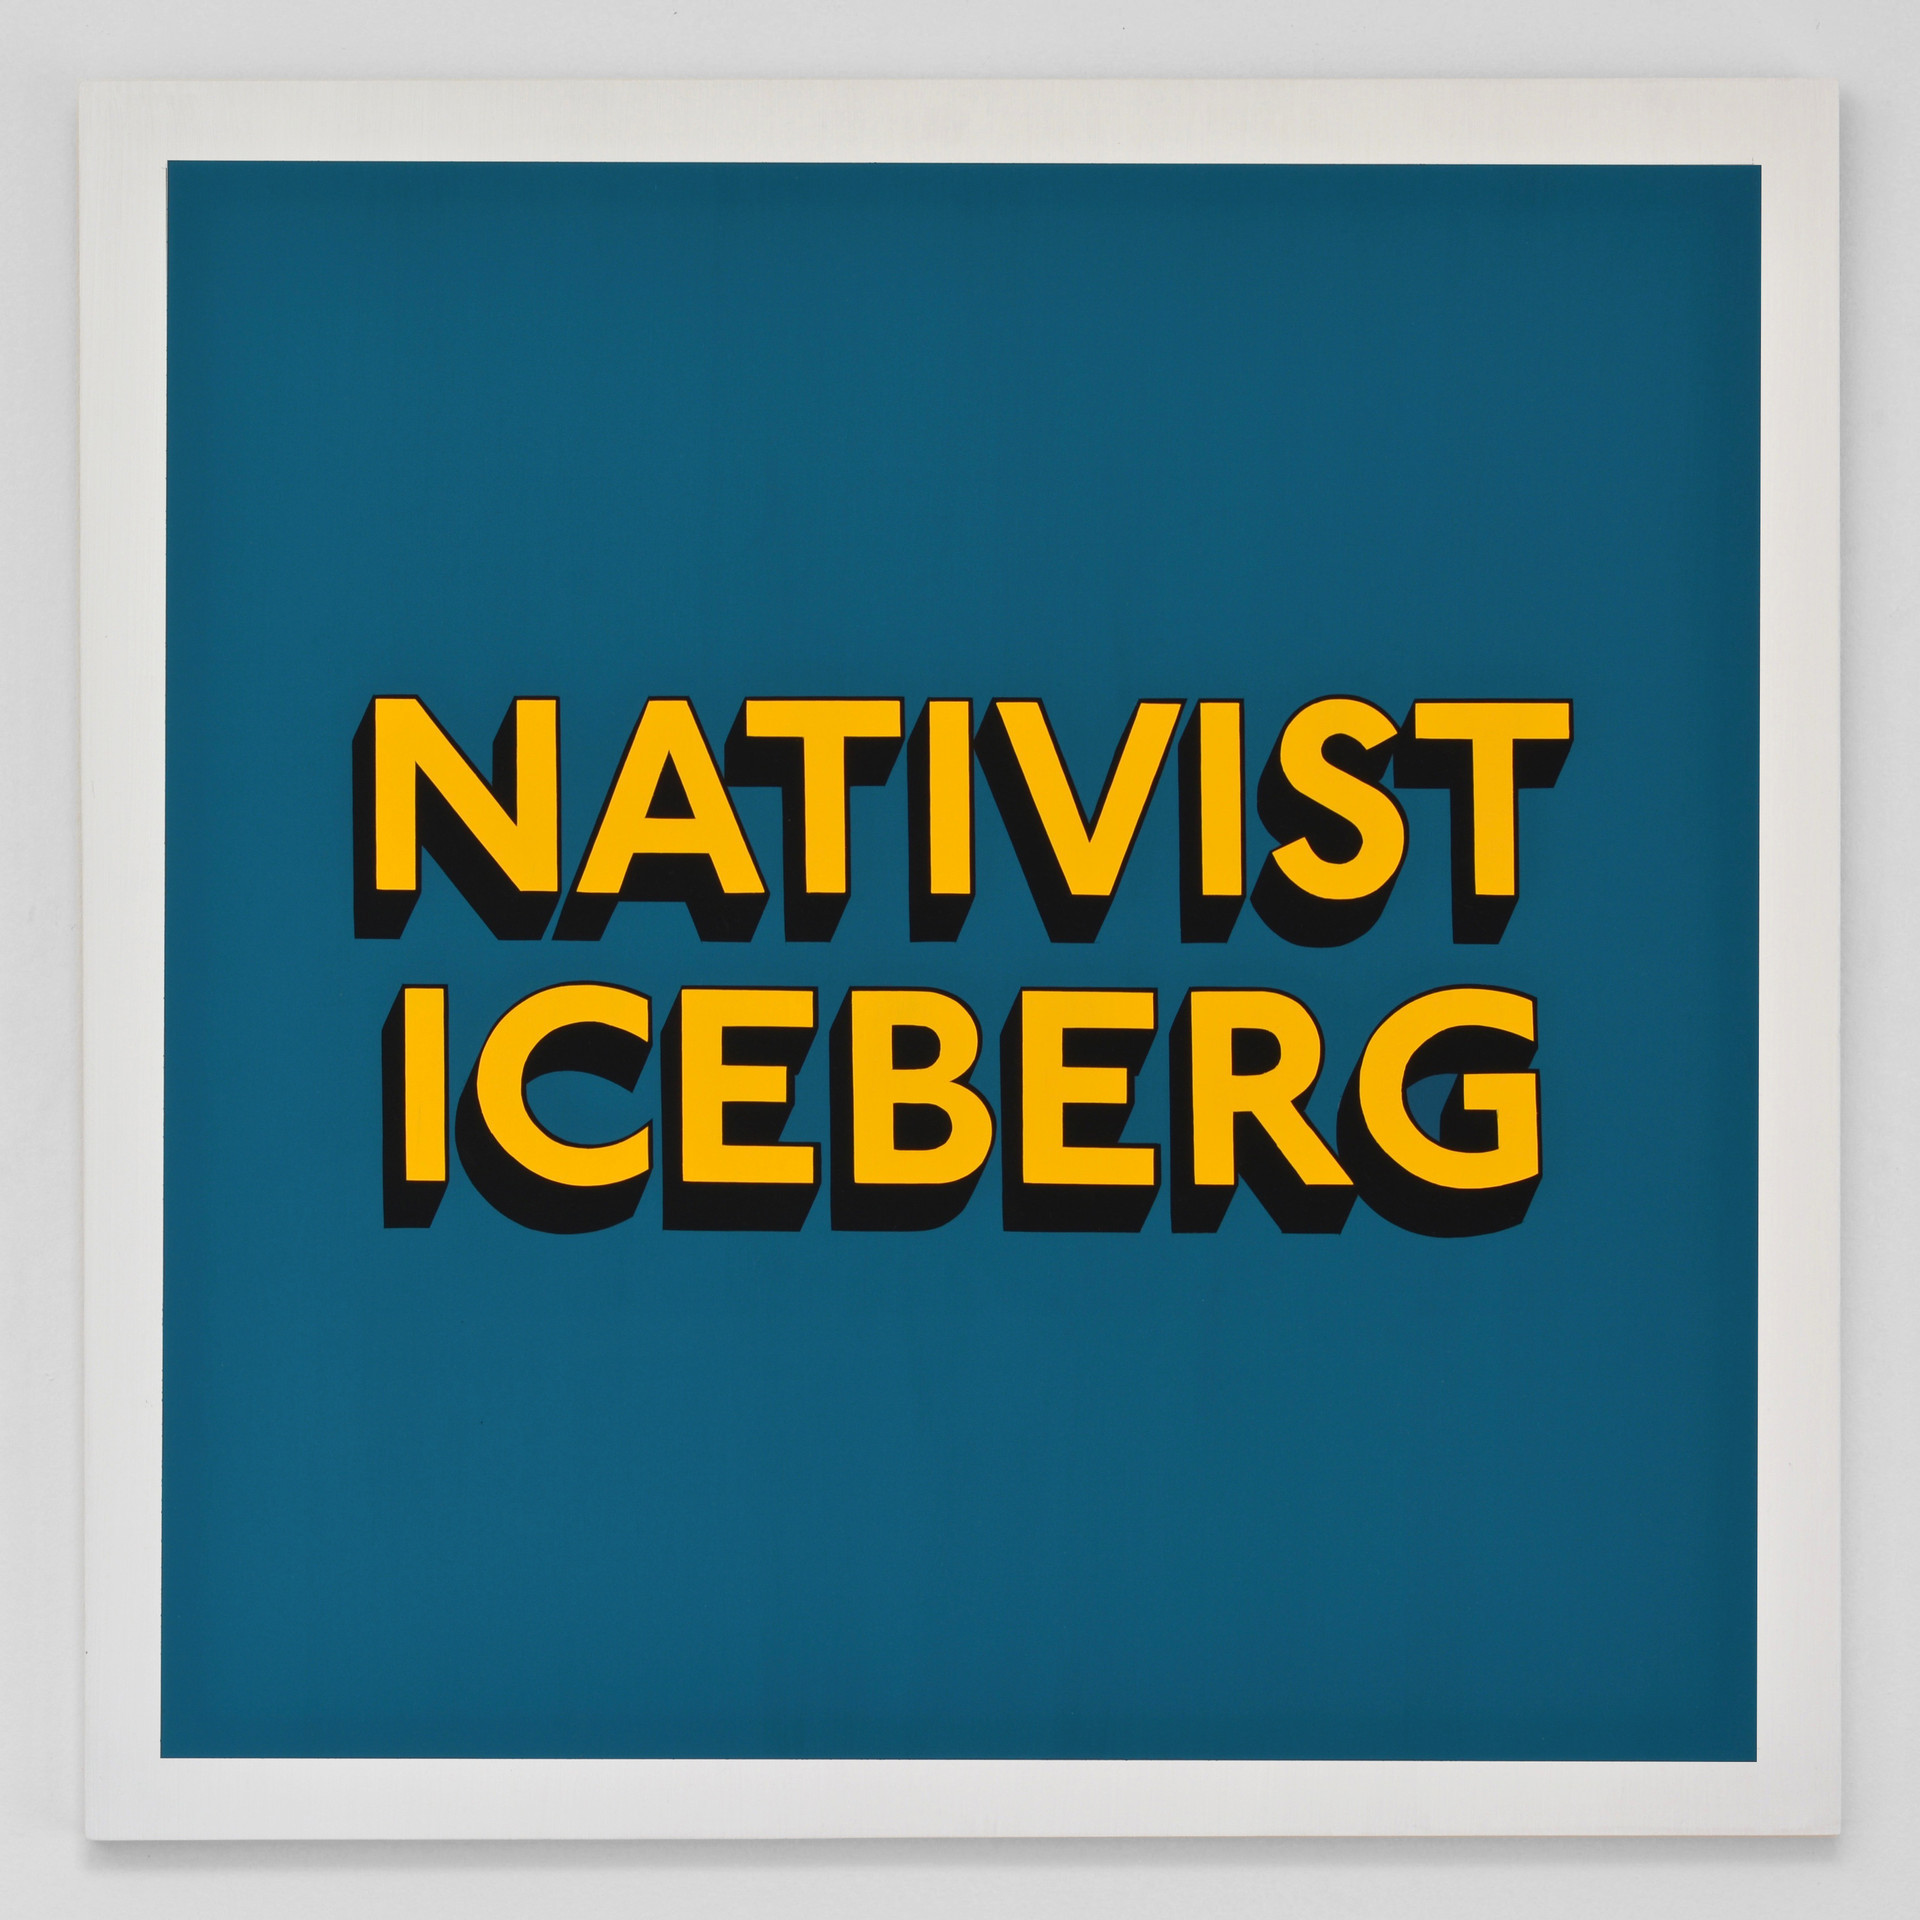 NATIVIST_ICEBERG.jpg